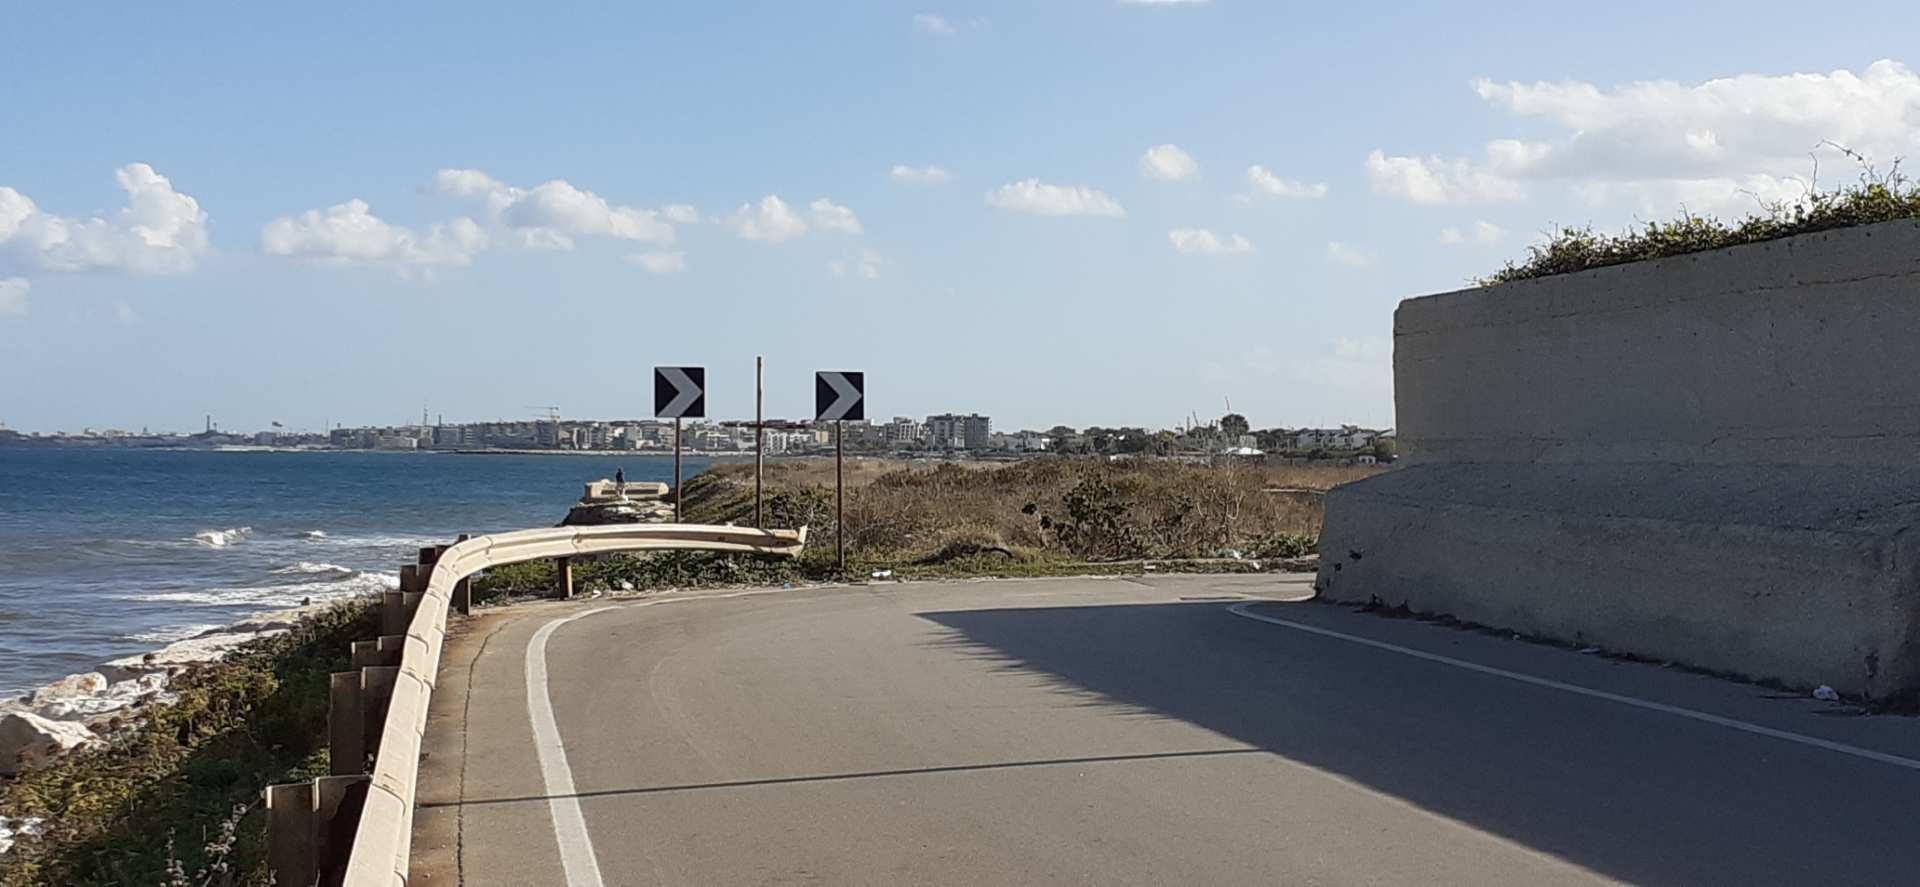 Palese, Bari